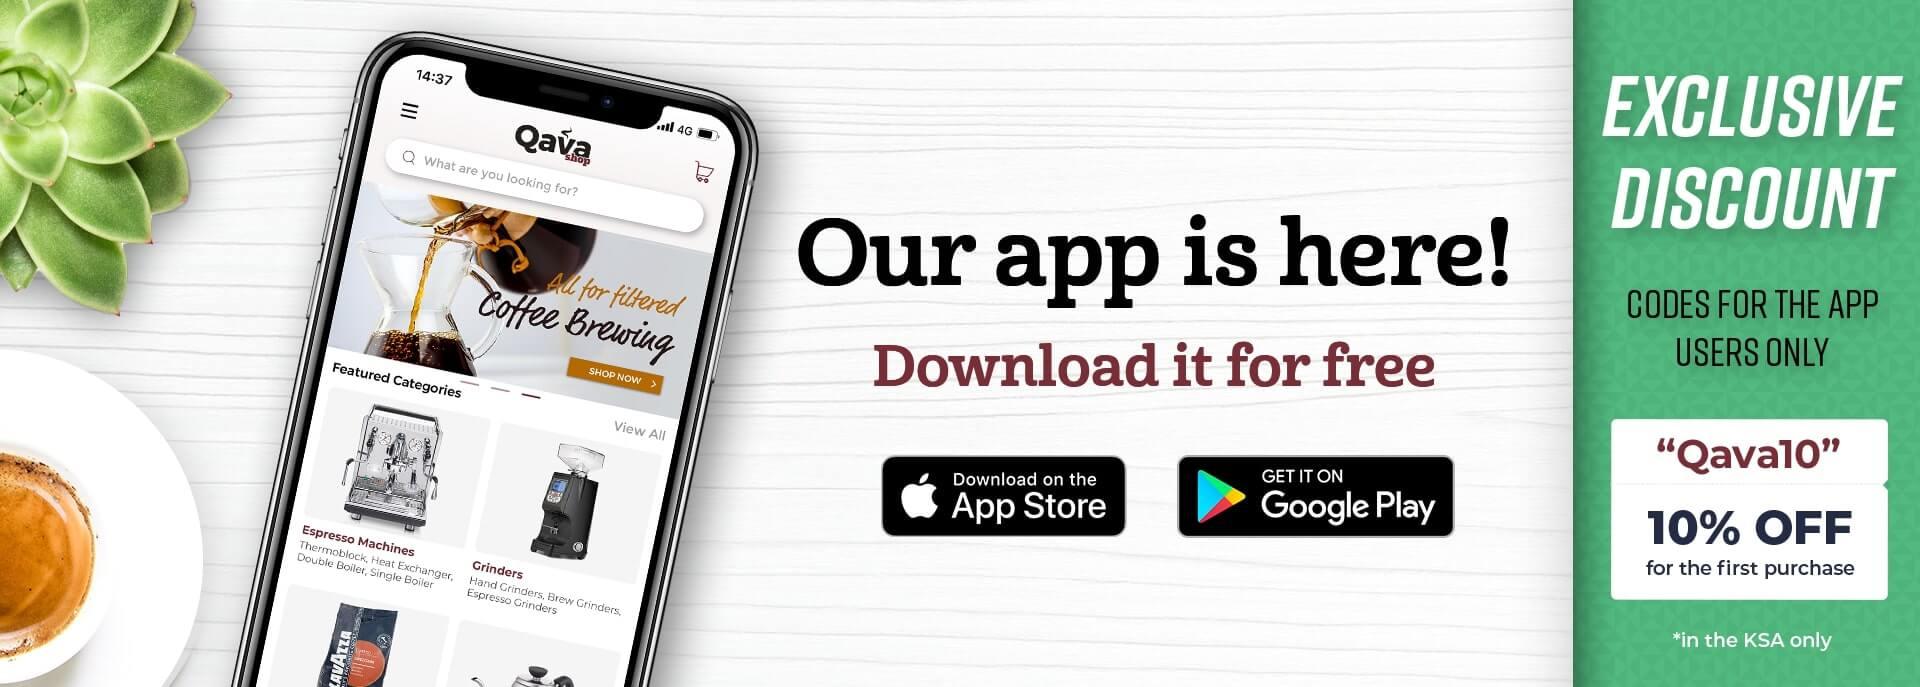 Qava app